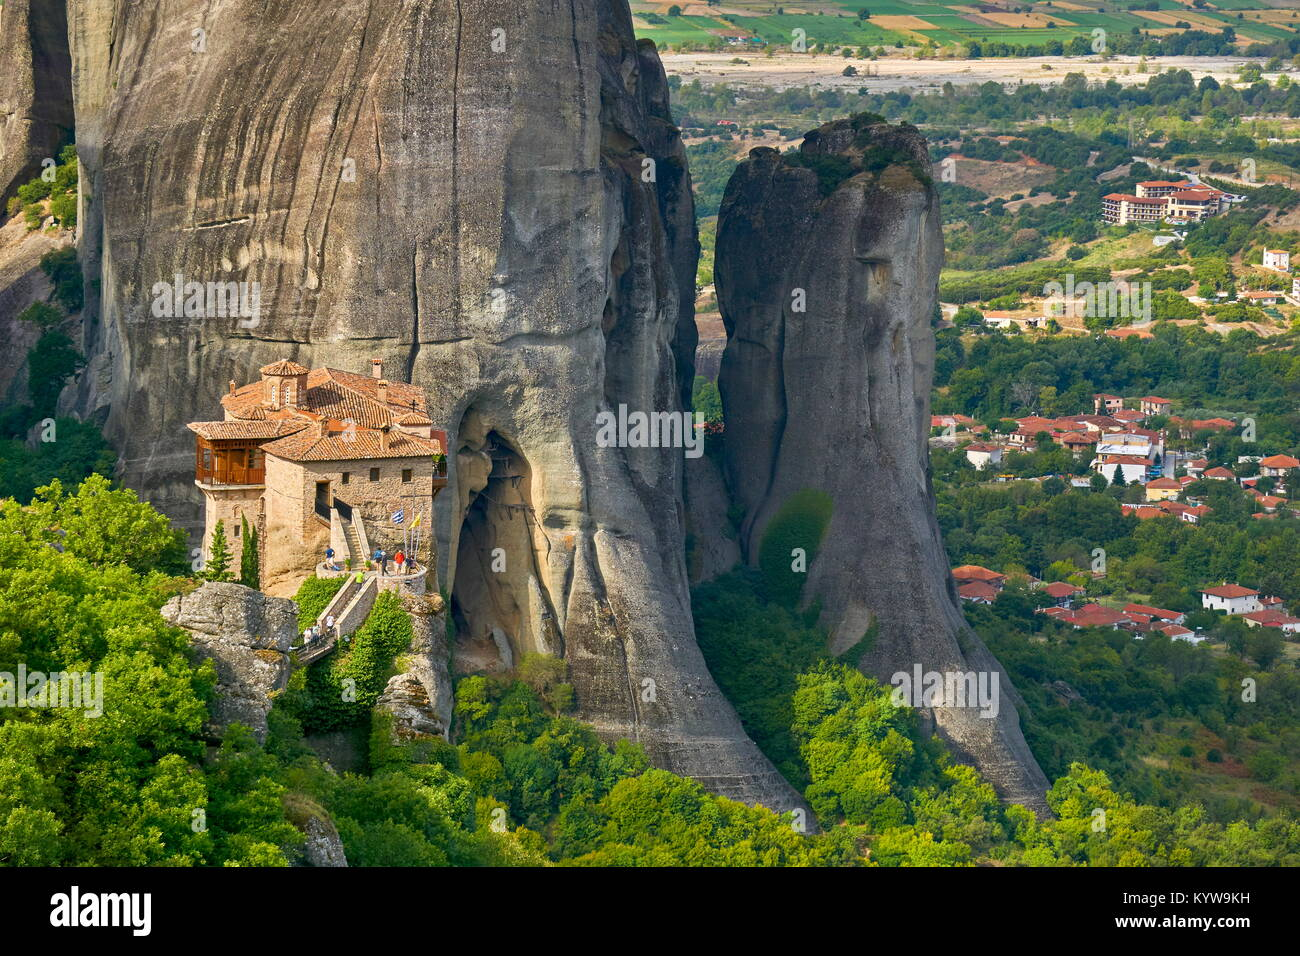 Greece - Roussanou Monastery at Meteora - Stock Image